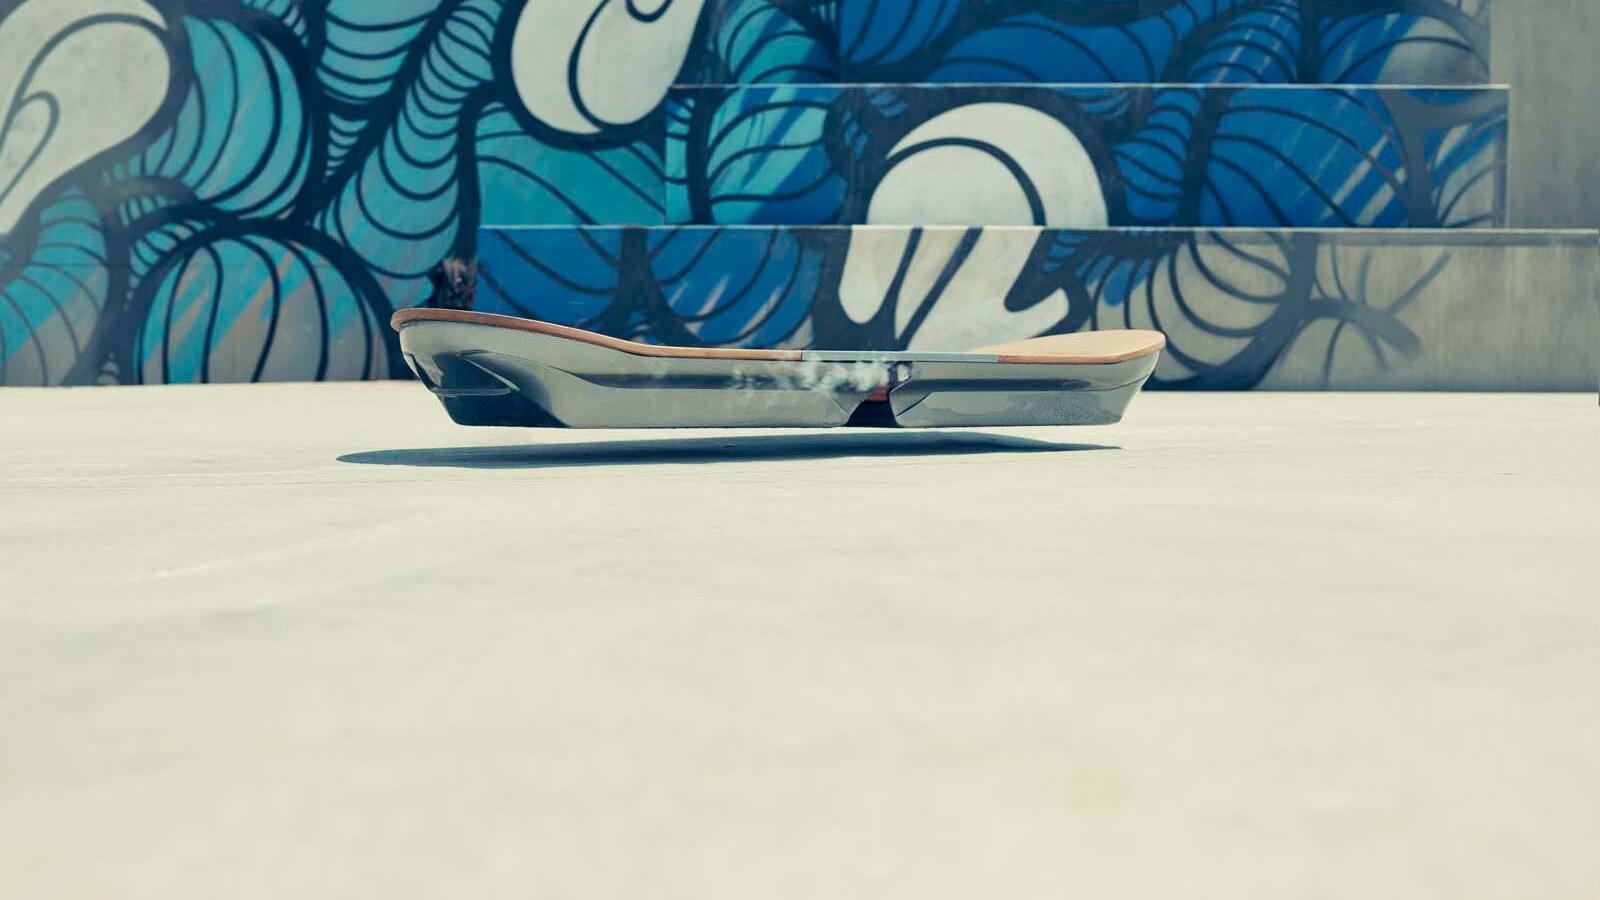 Lexus Hoverboard